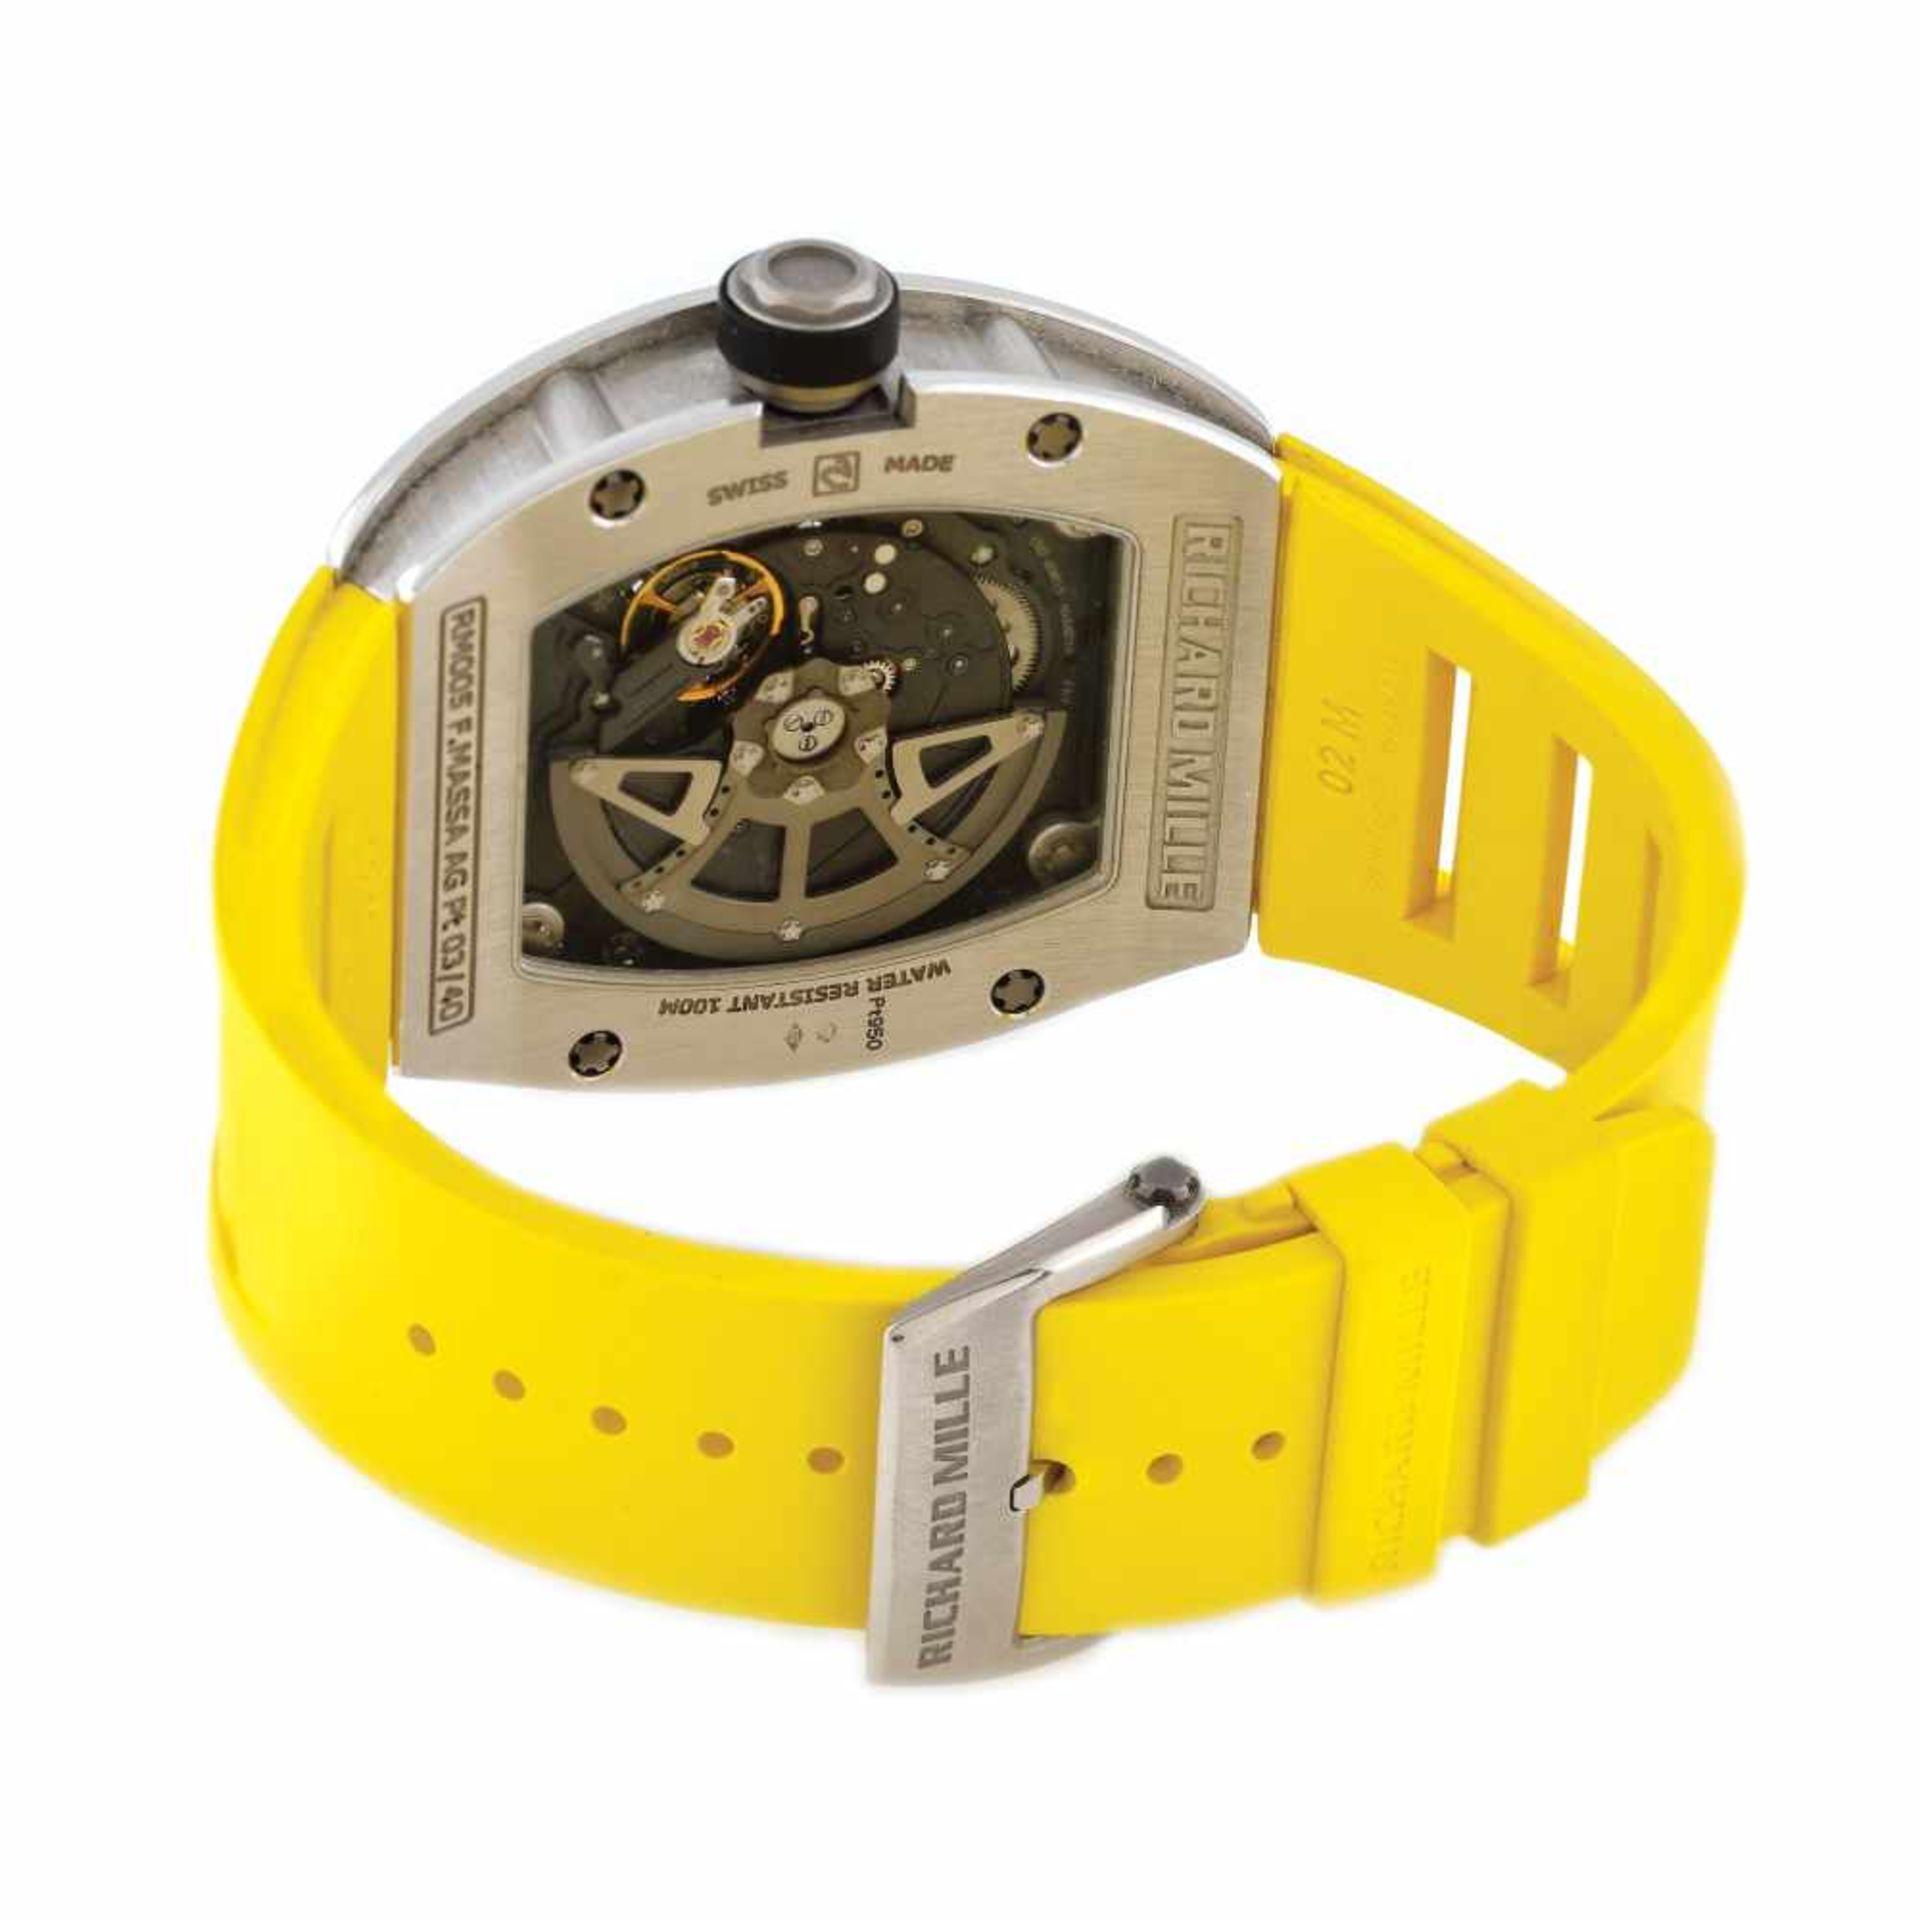 Richard Mille RM005 Felipe Massa AG TI wristwatch, platinum, men, limited edition 3/40 - Bild 3 aus 4